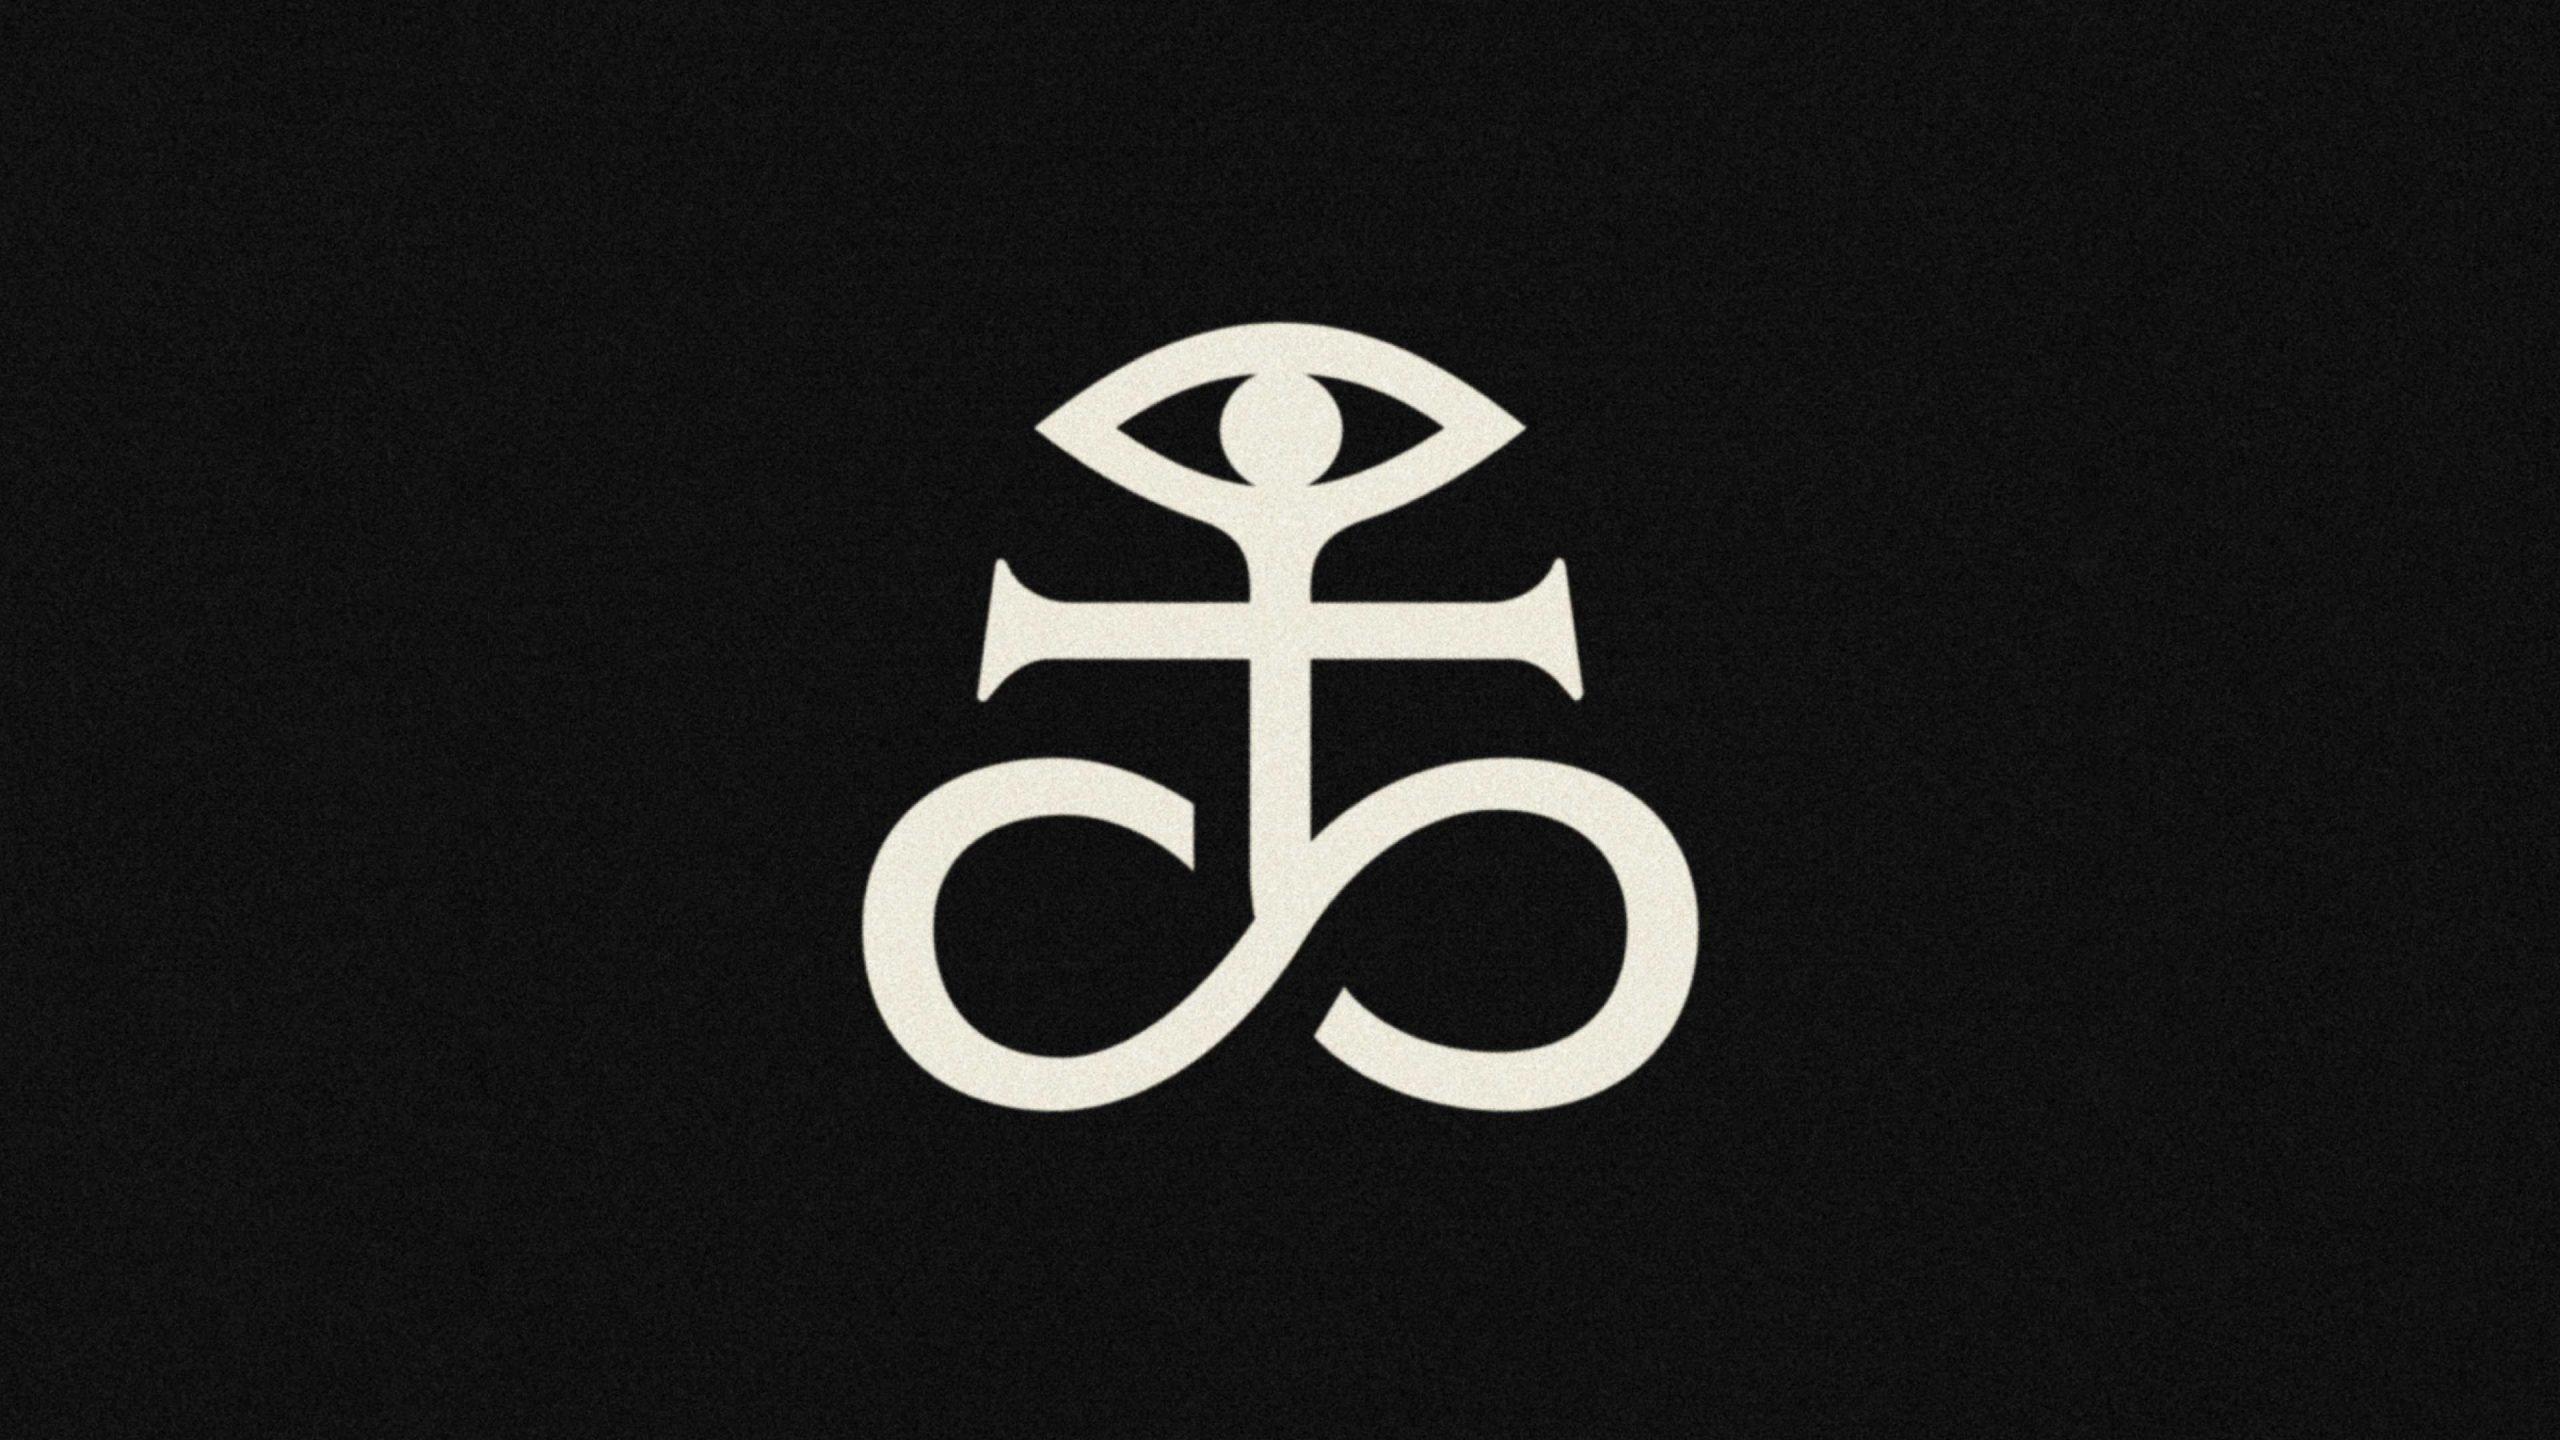 JOEY-BADASS-THE-LIGHT-PACK-symbol-01